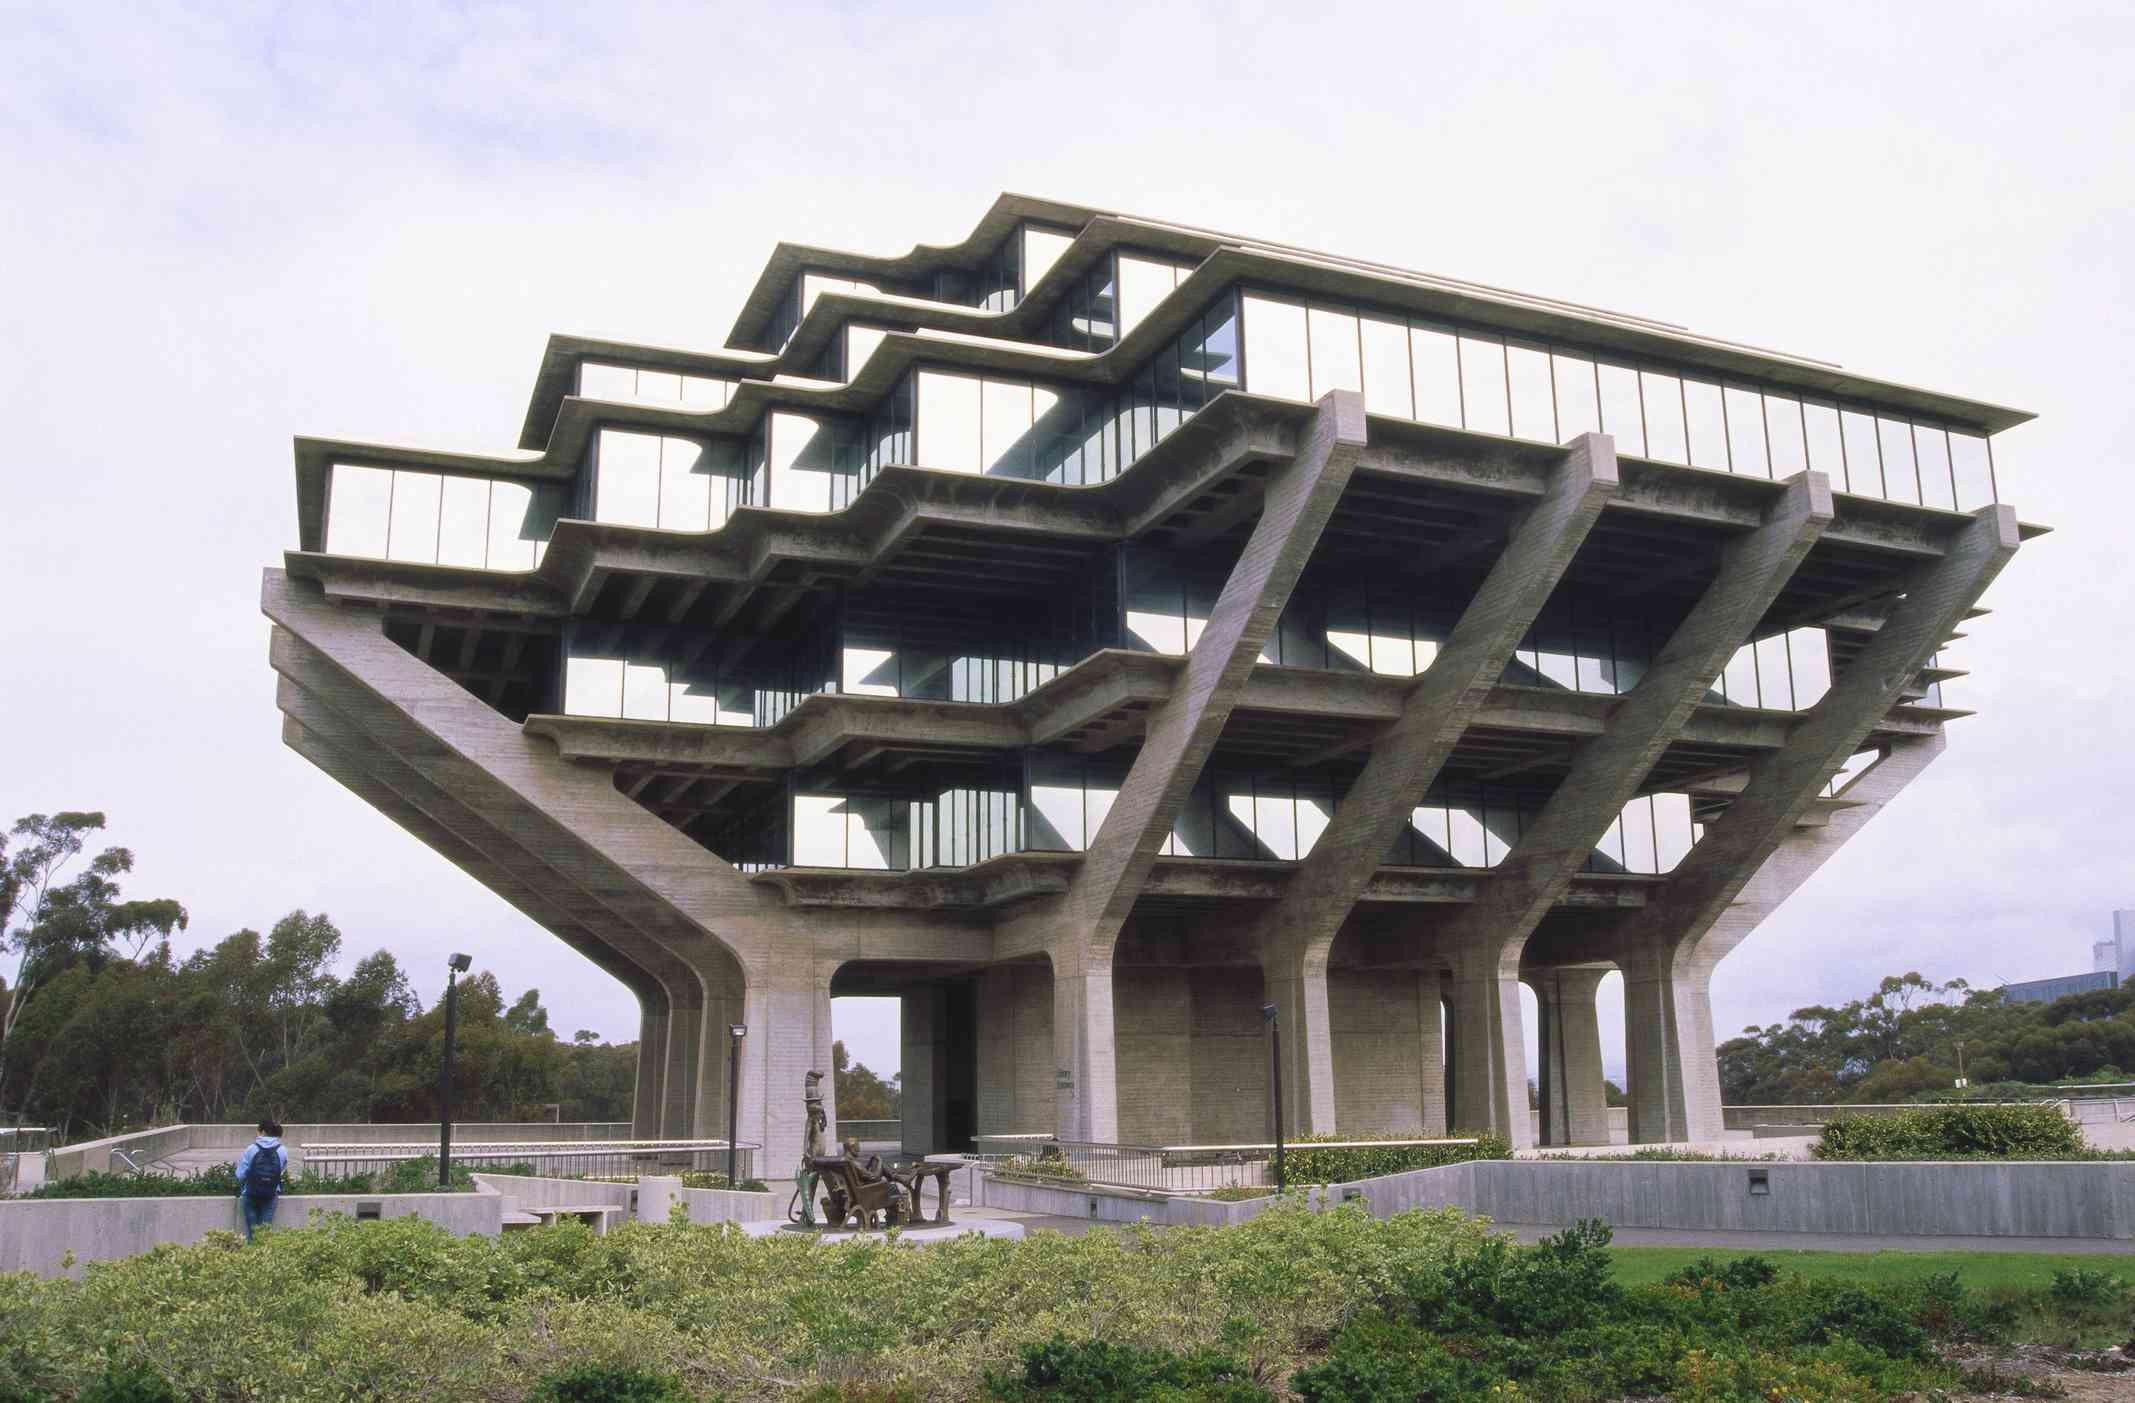 Geisel Library, La Jolla, California